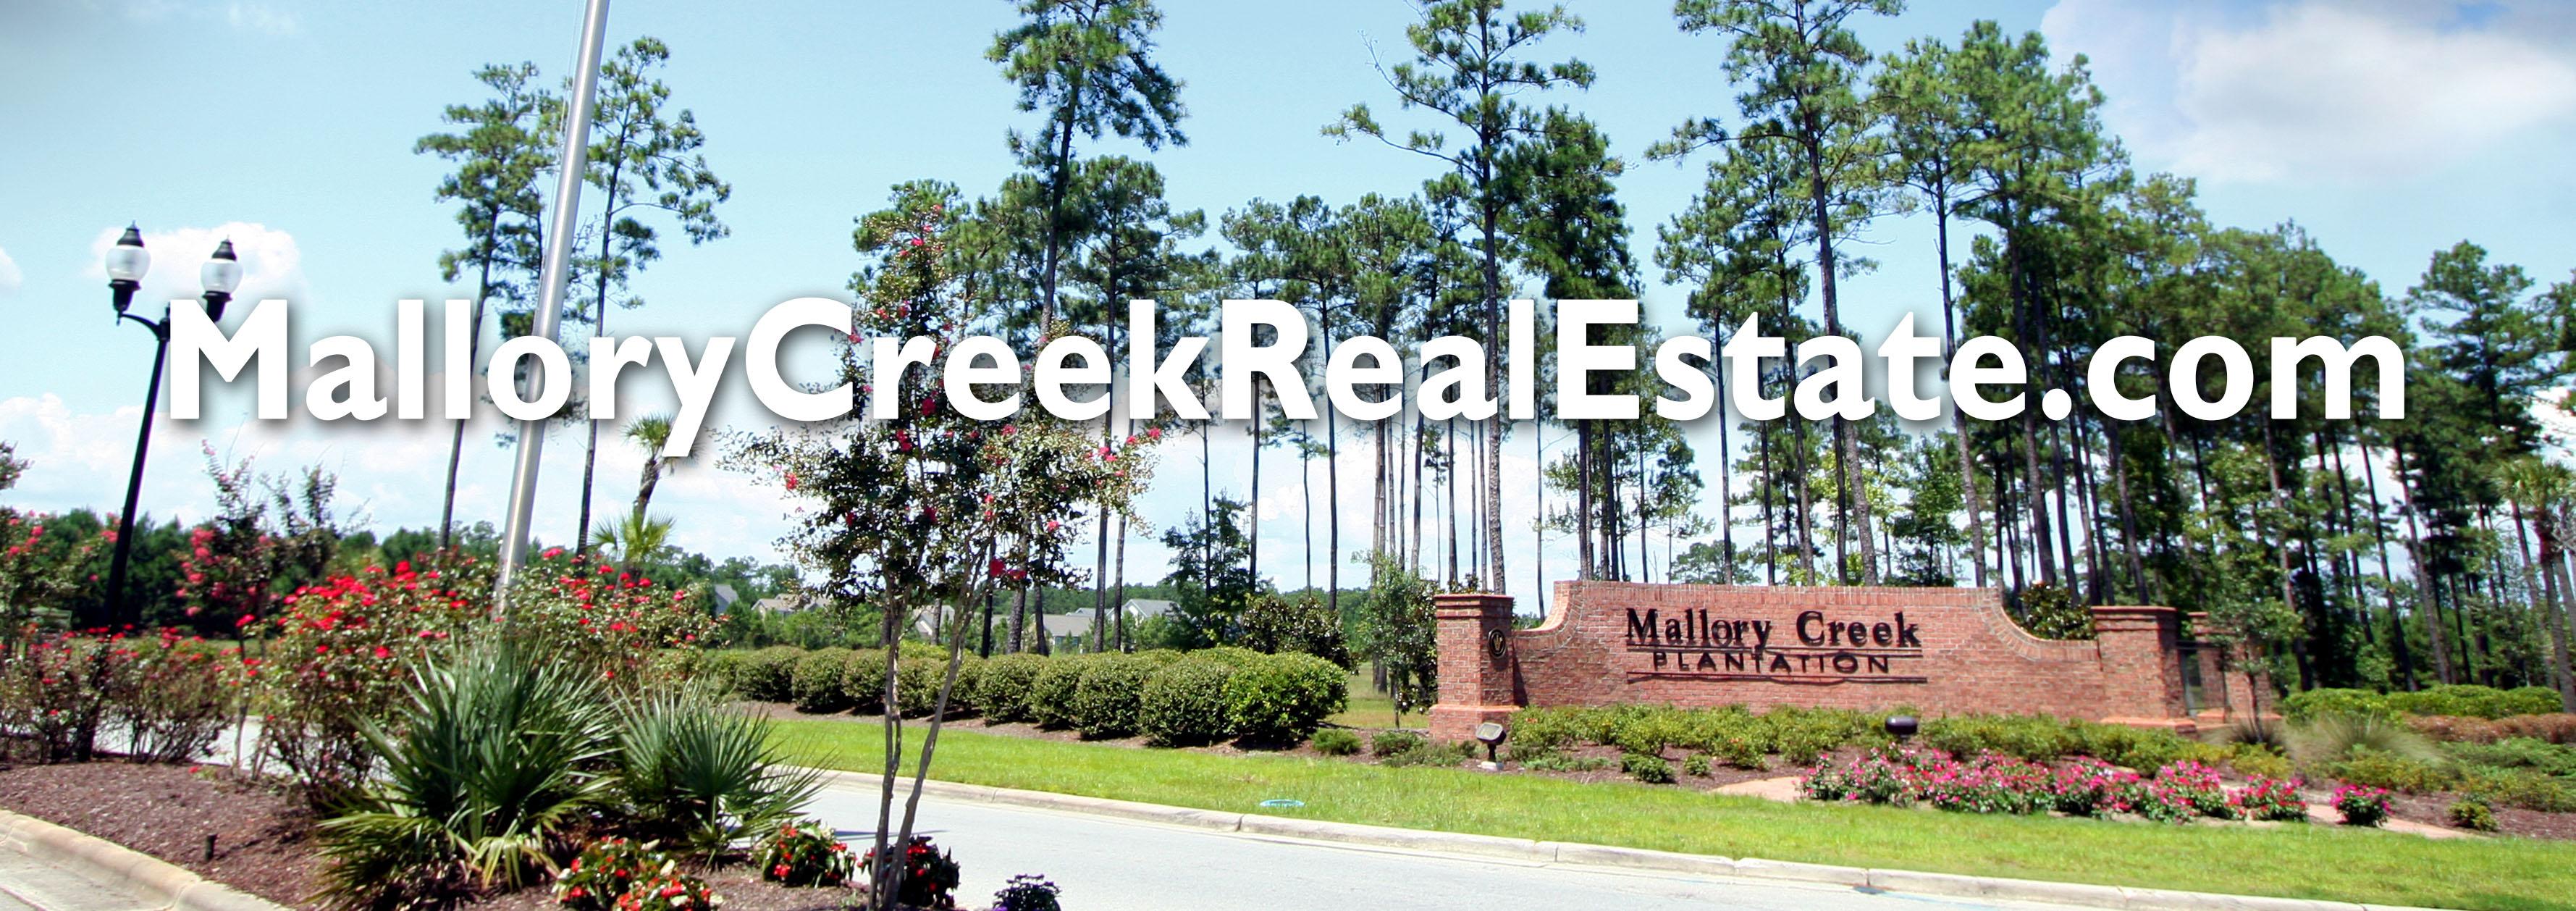 Mallory Creek Real Estate